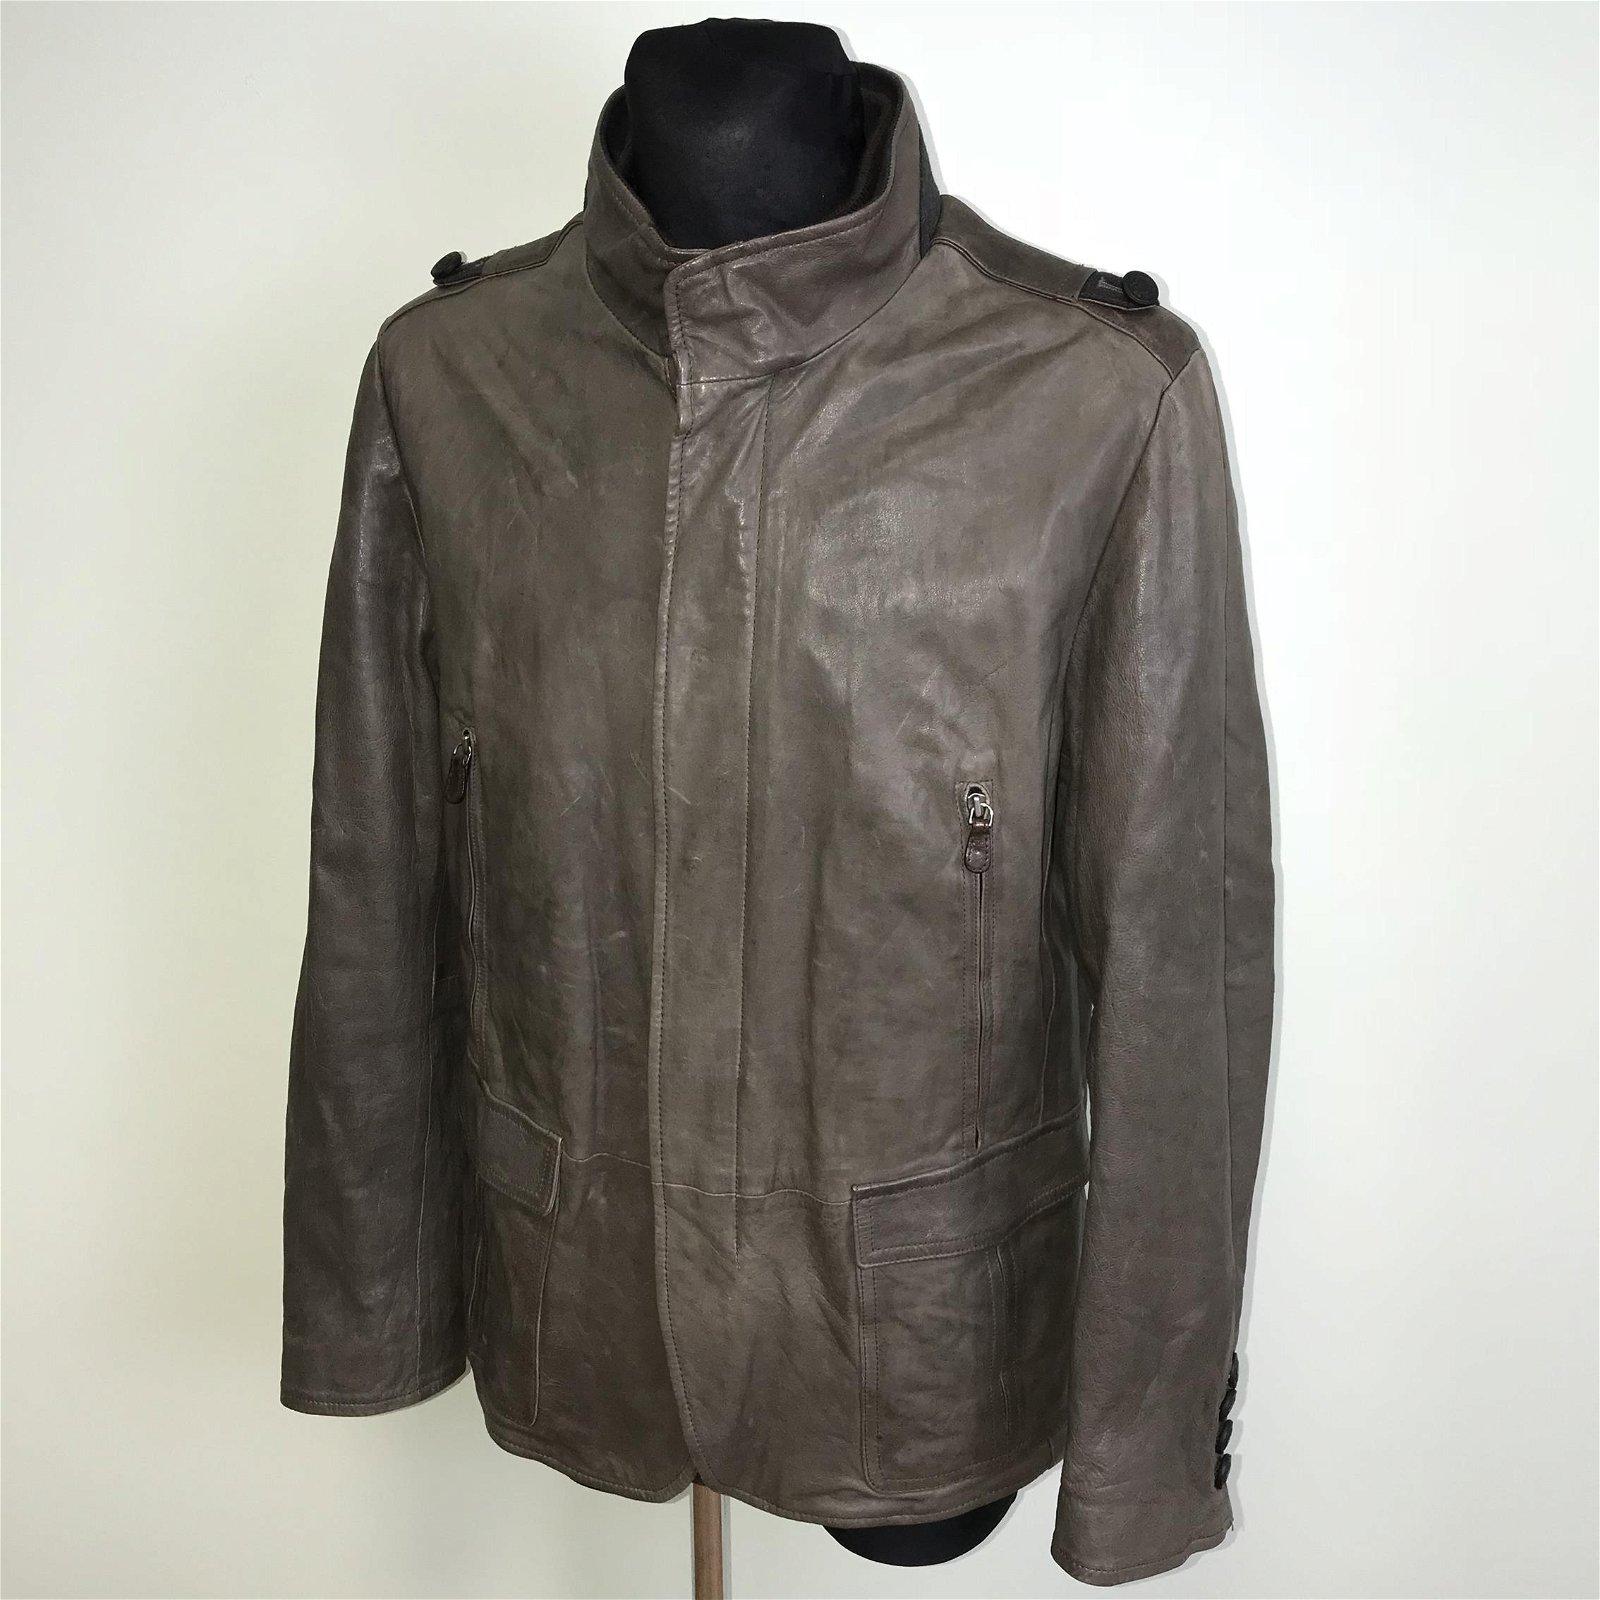 Vintage Men's Military Style Leather Jacket